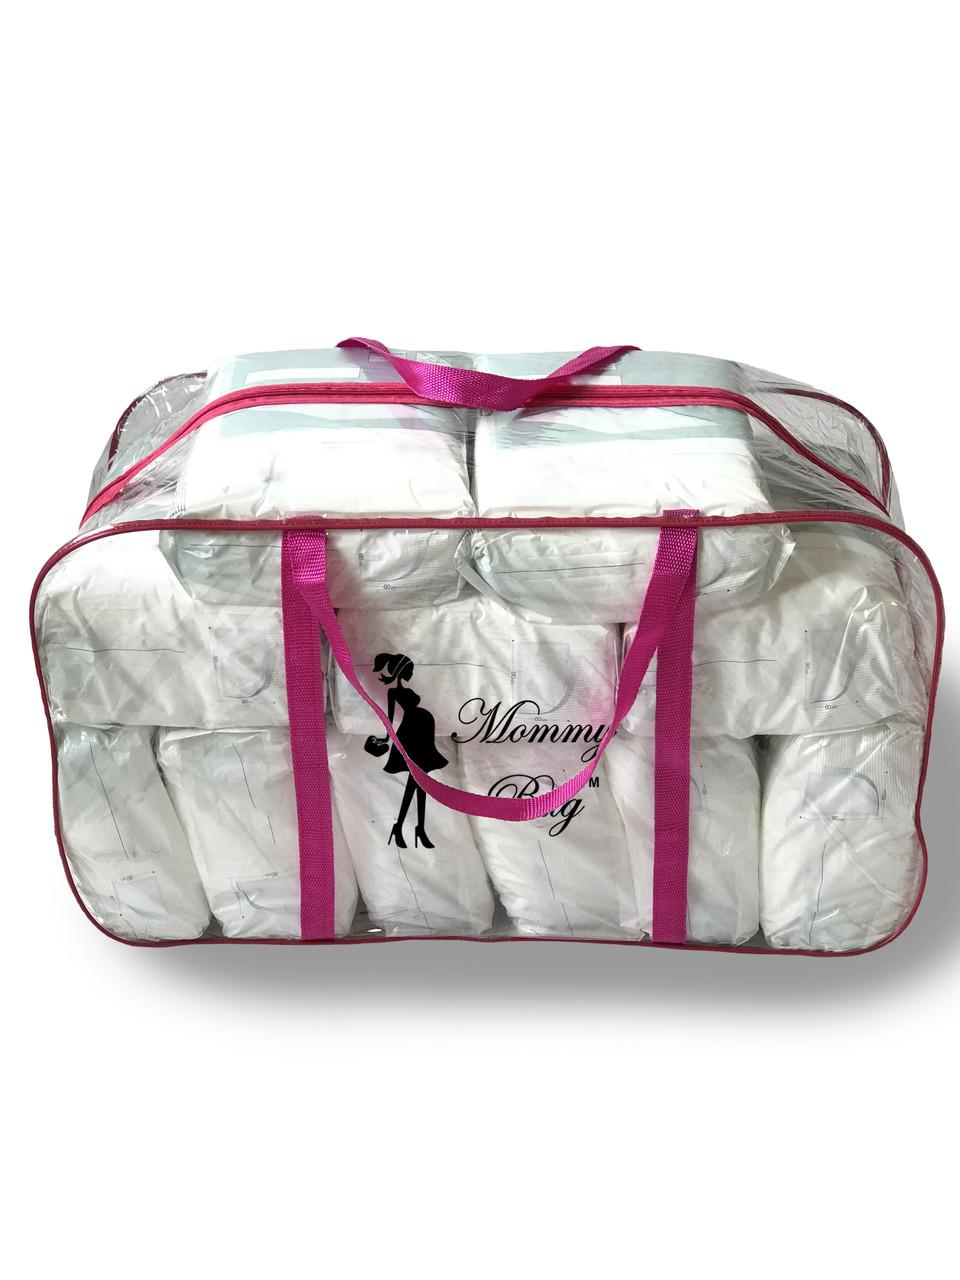 8d0b184277cb Сумка прозрачная в роддом Mommy Bag - XL - 65*35*30 см Розовая от ...